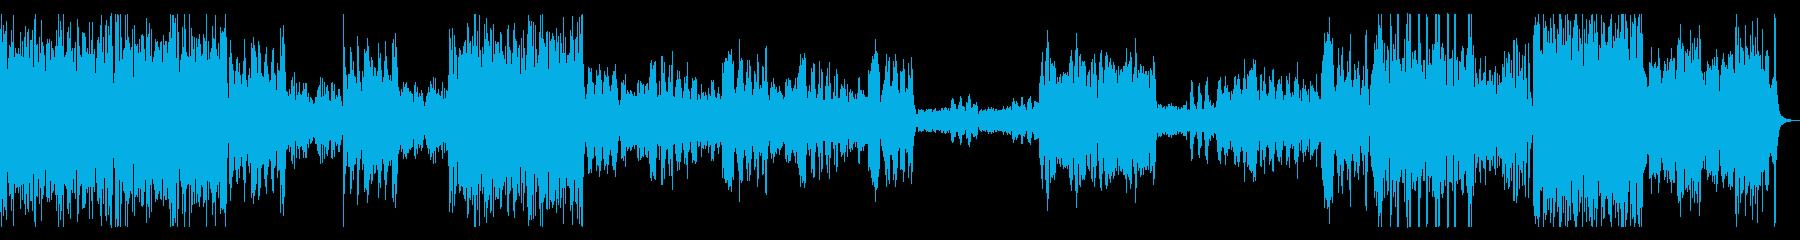 Coppelia to Mazurka Orchestra Edition's reproduced waveform